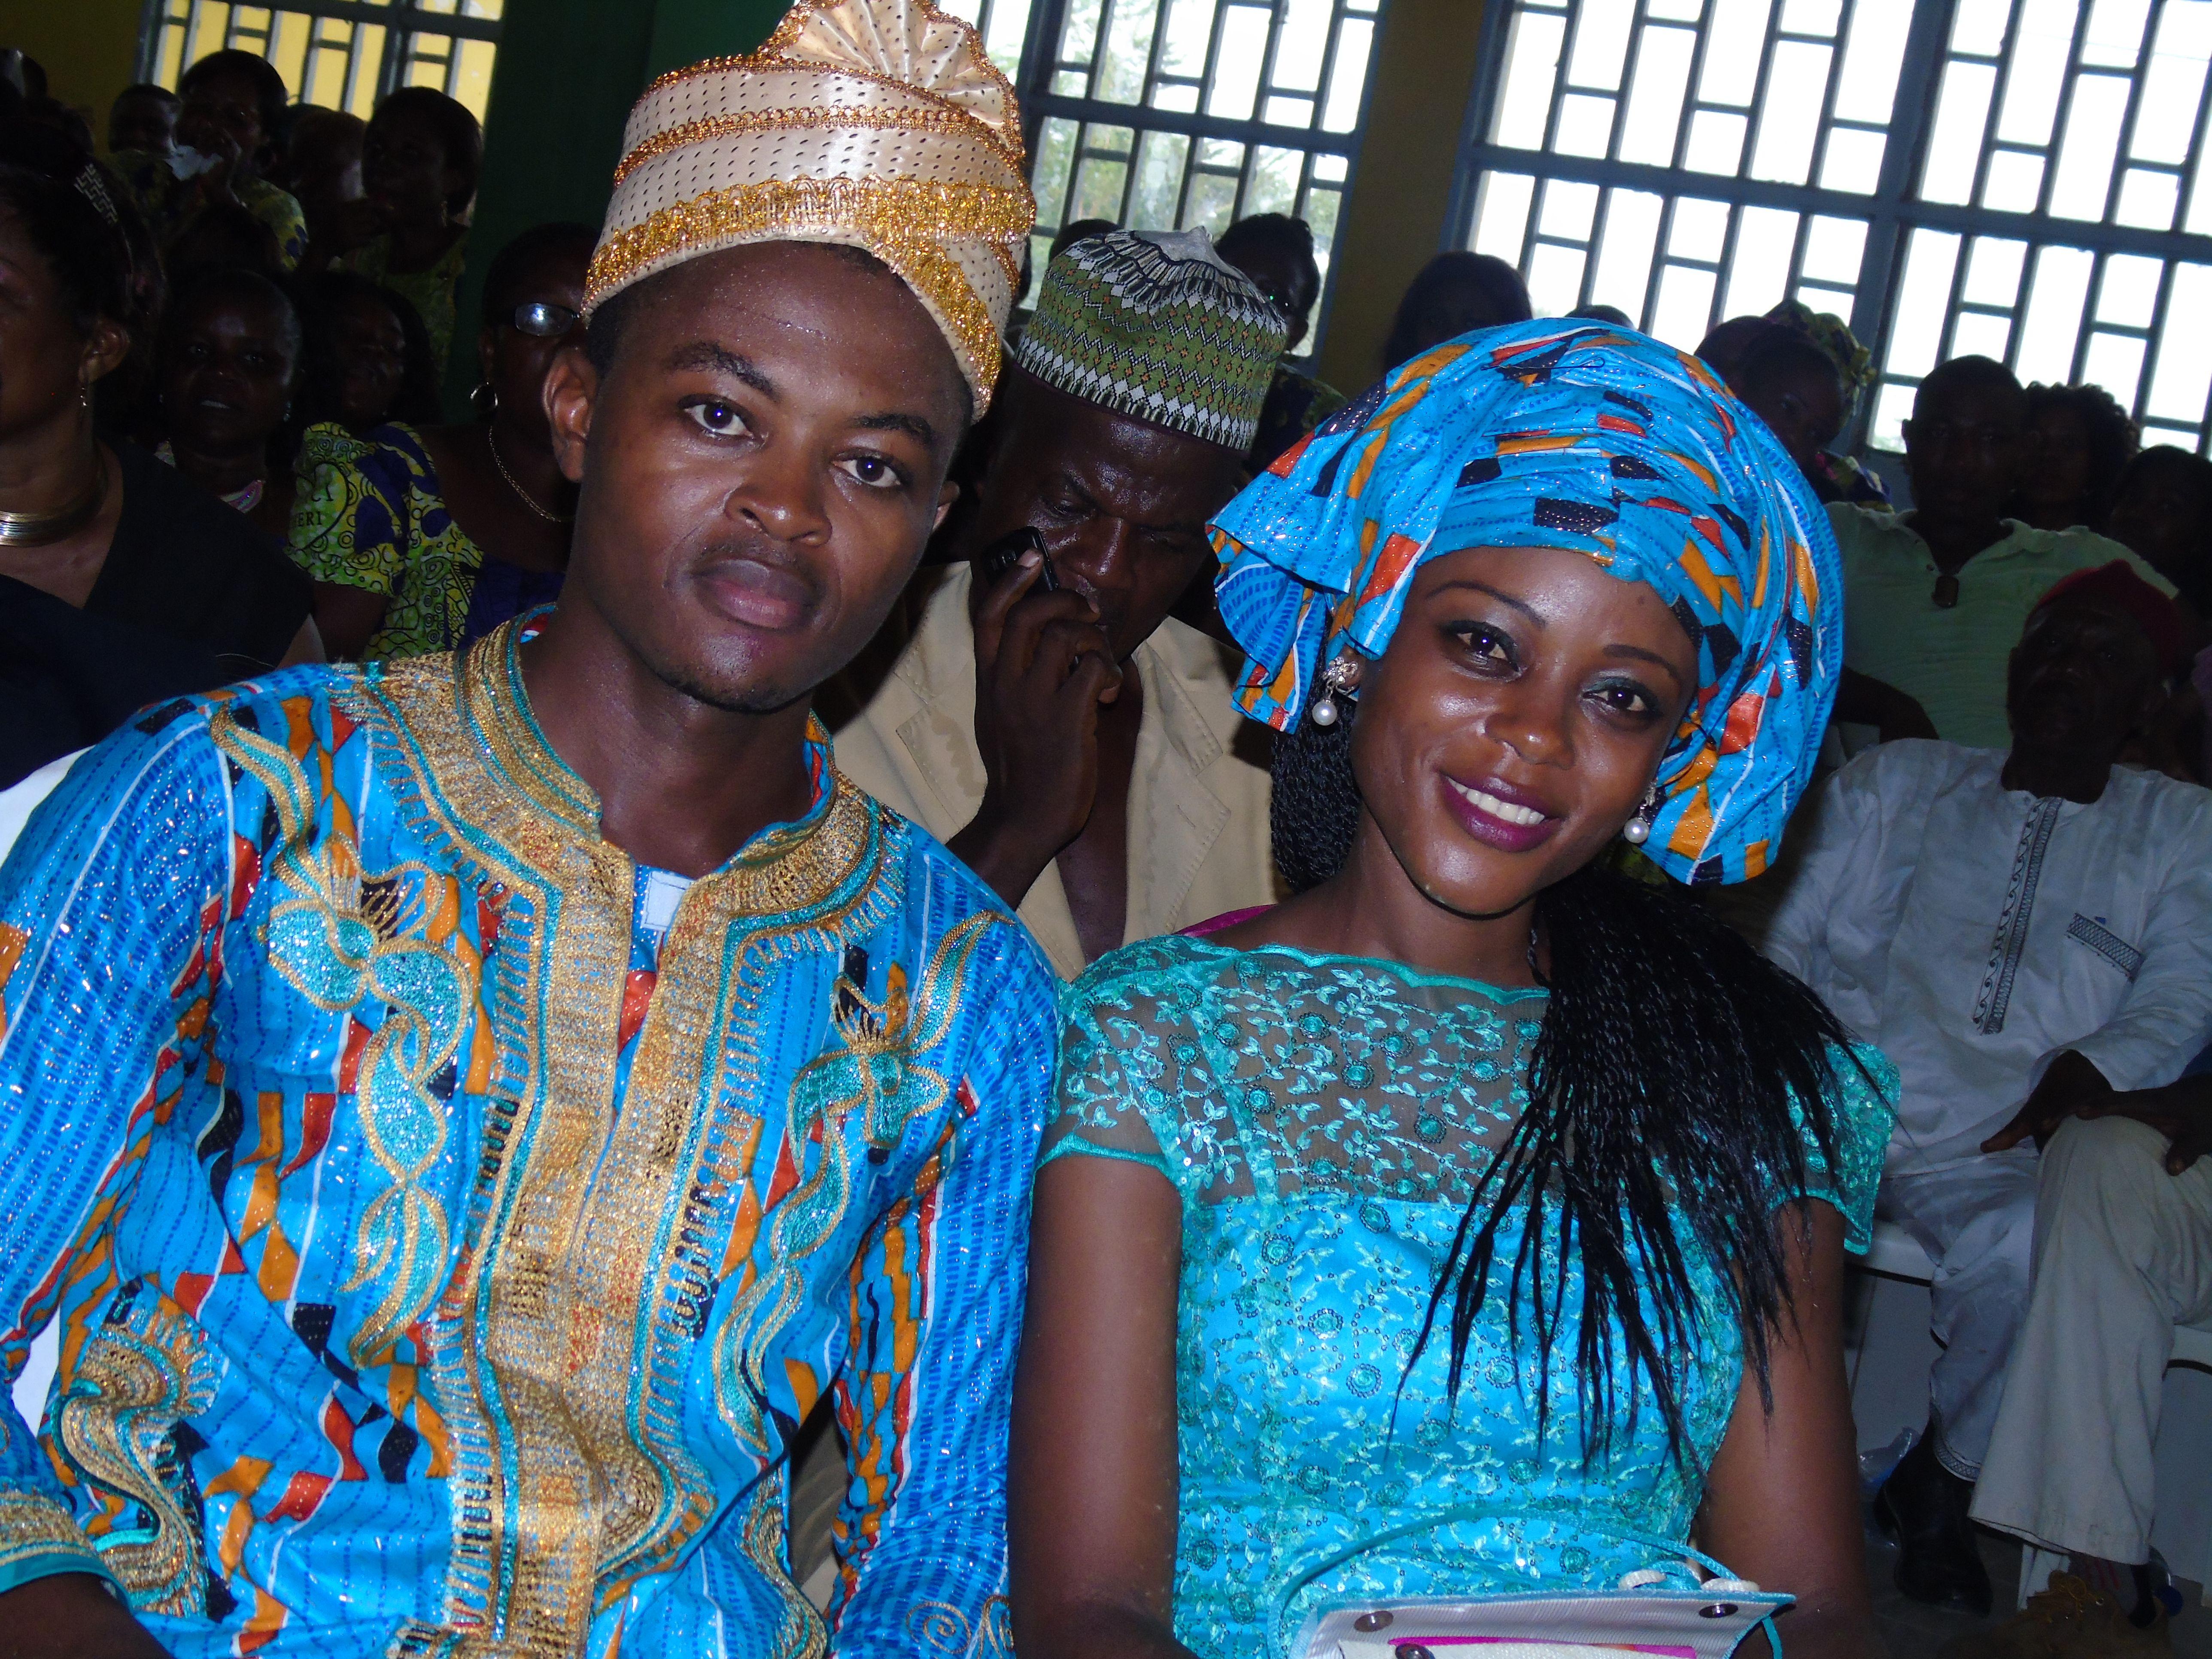 Cameroonian wedding dresses new style mars 2015 festival